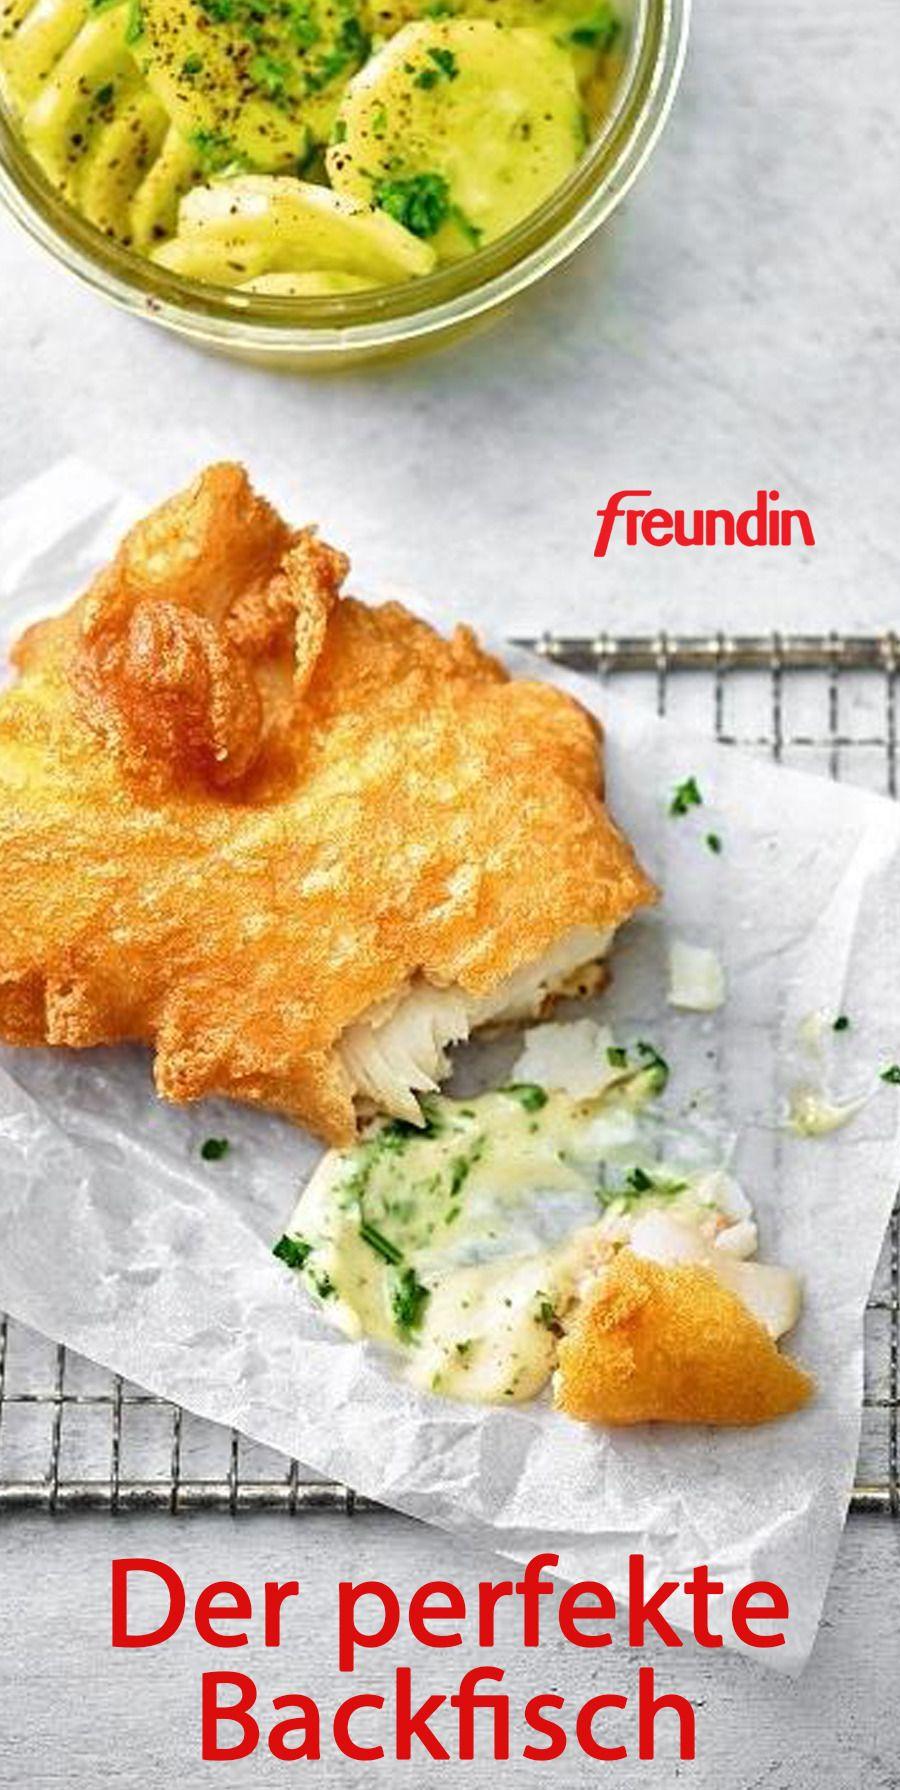 Photo of The perfect fried fish | freundin.de